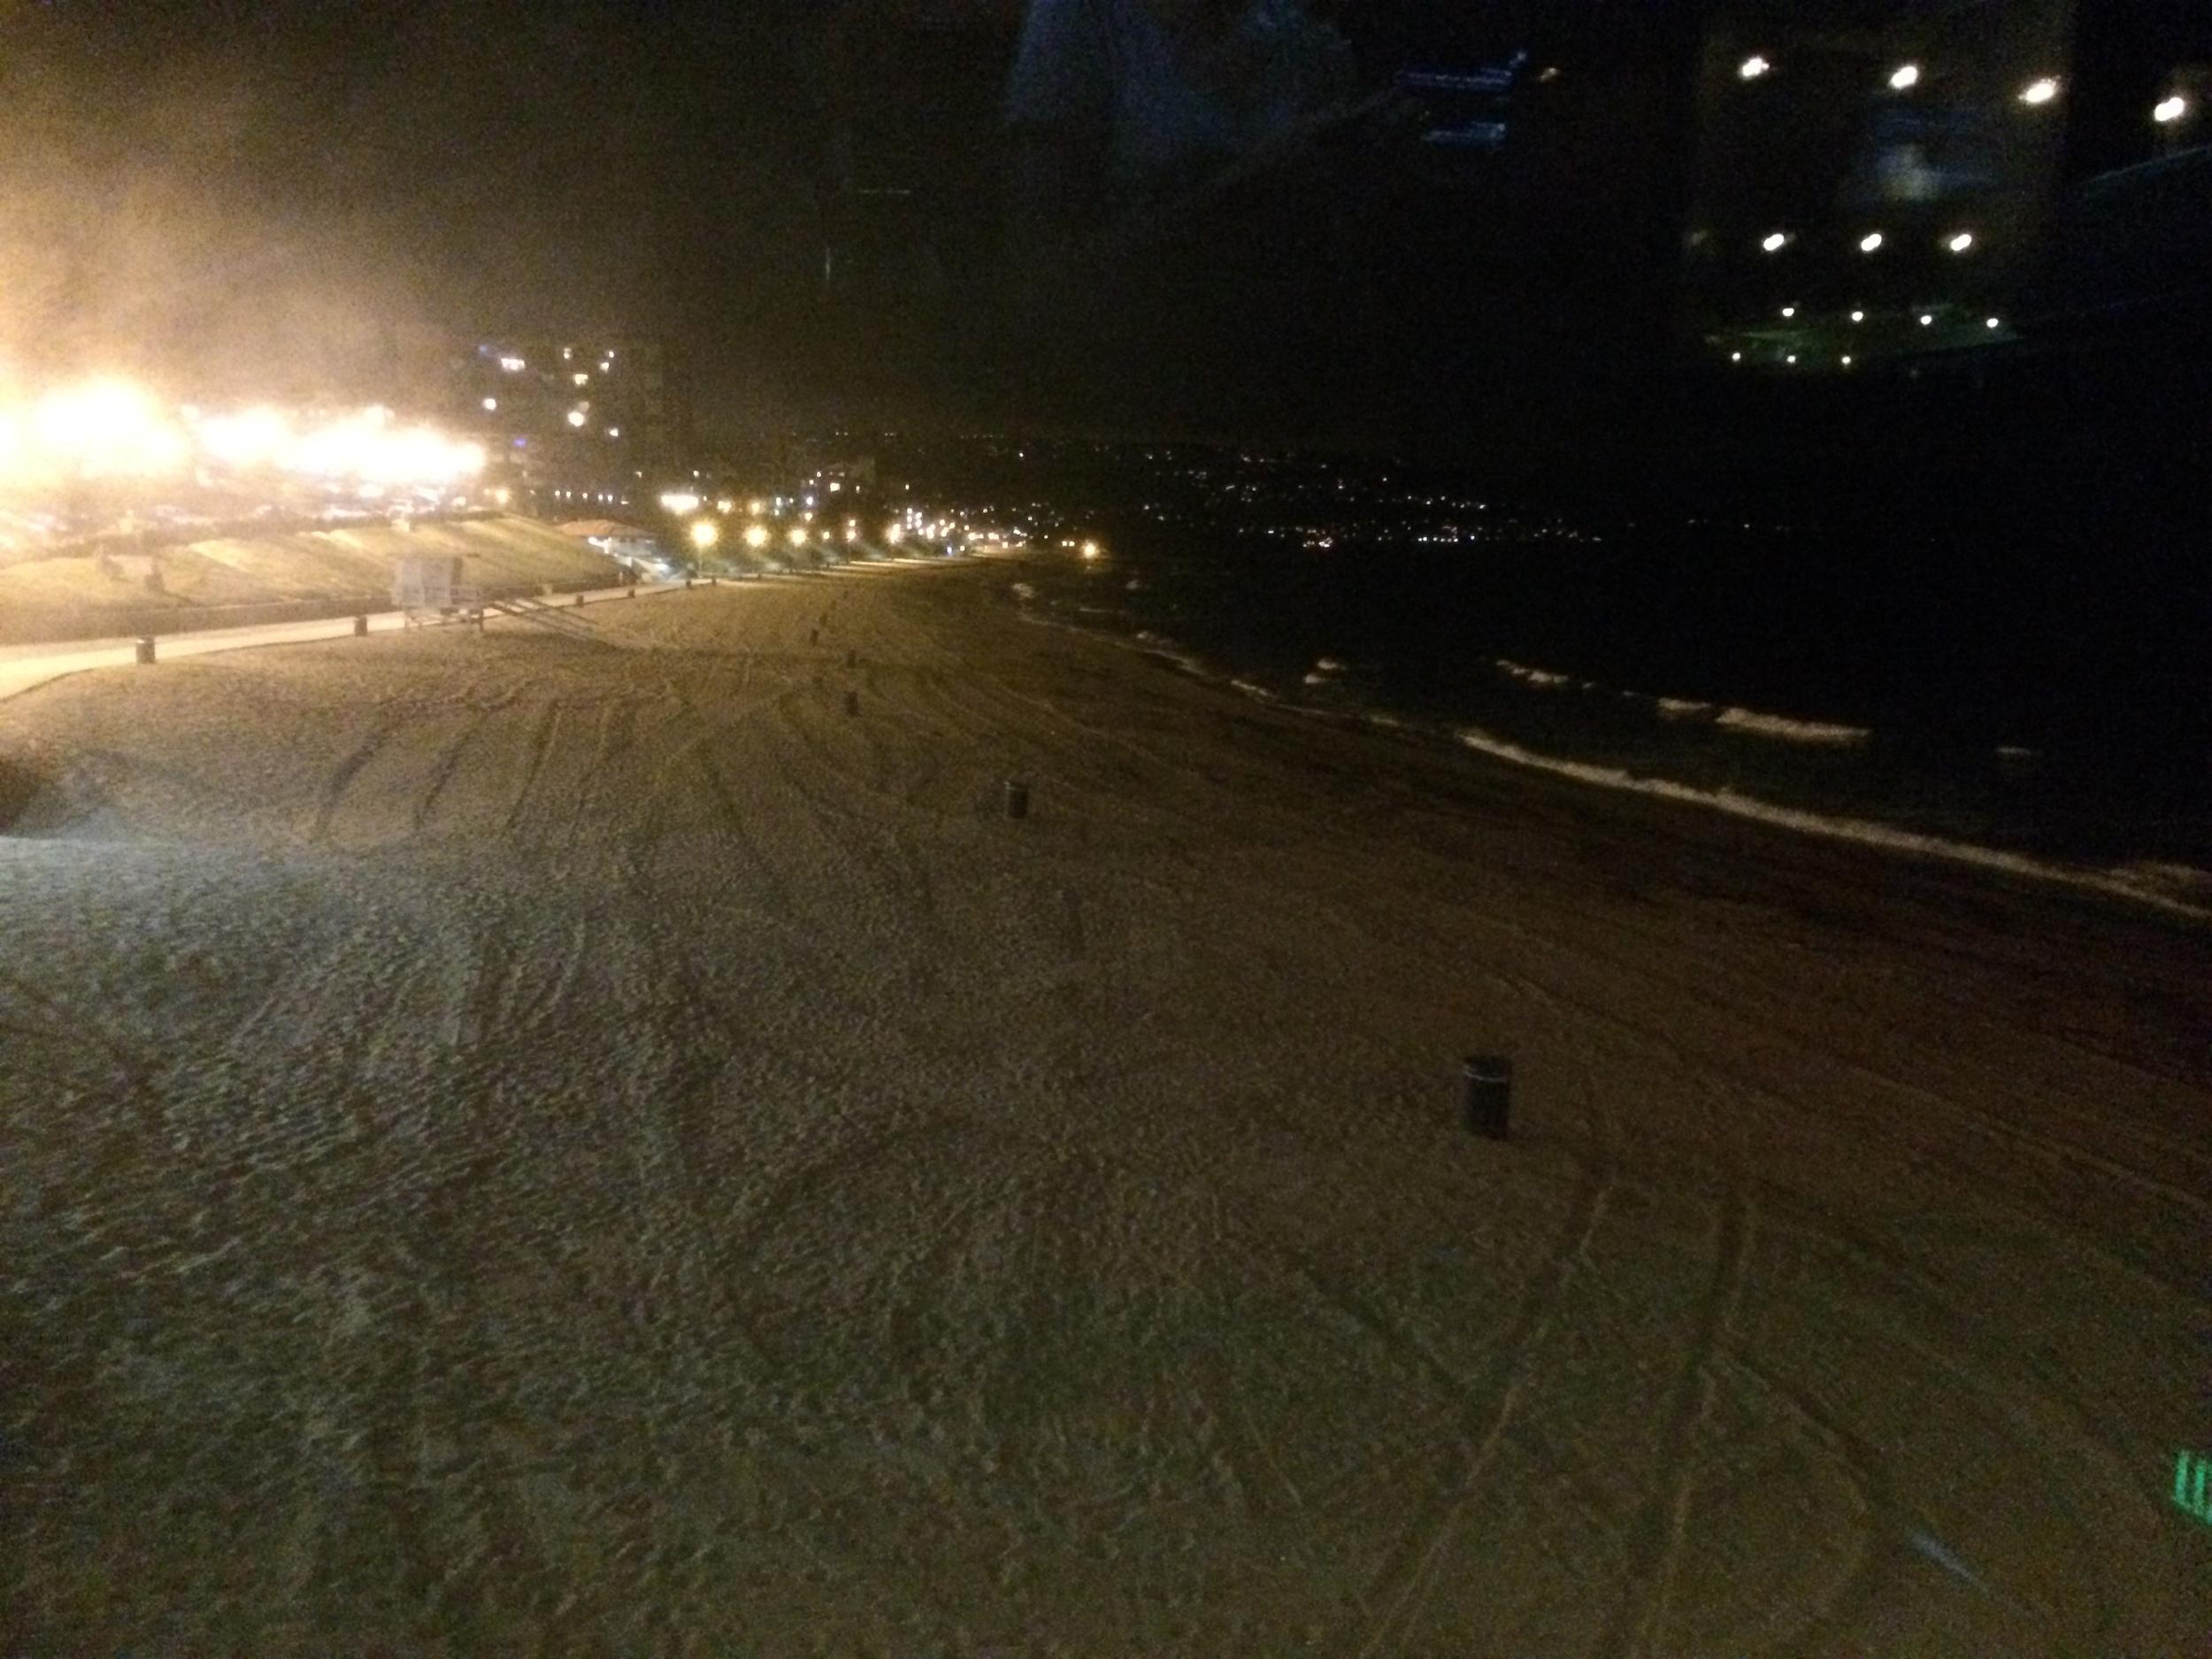 First night beach view